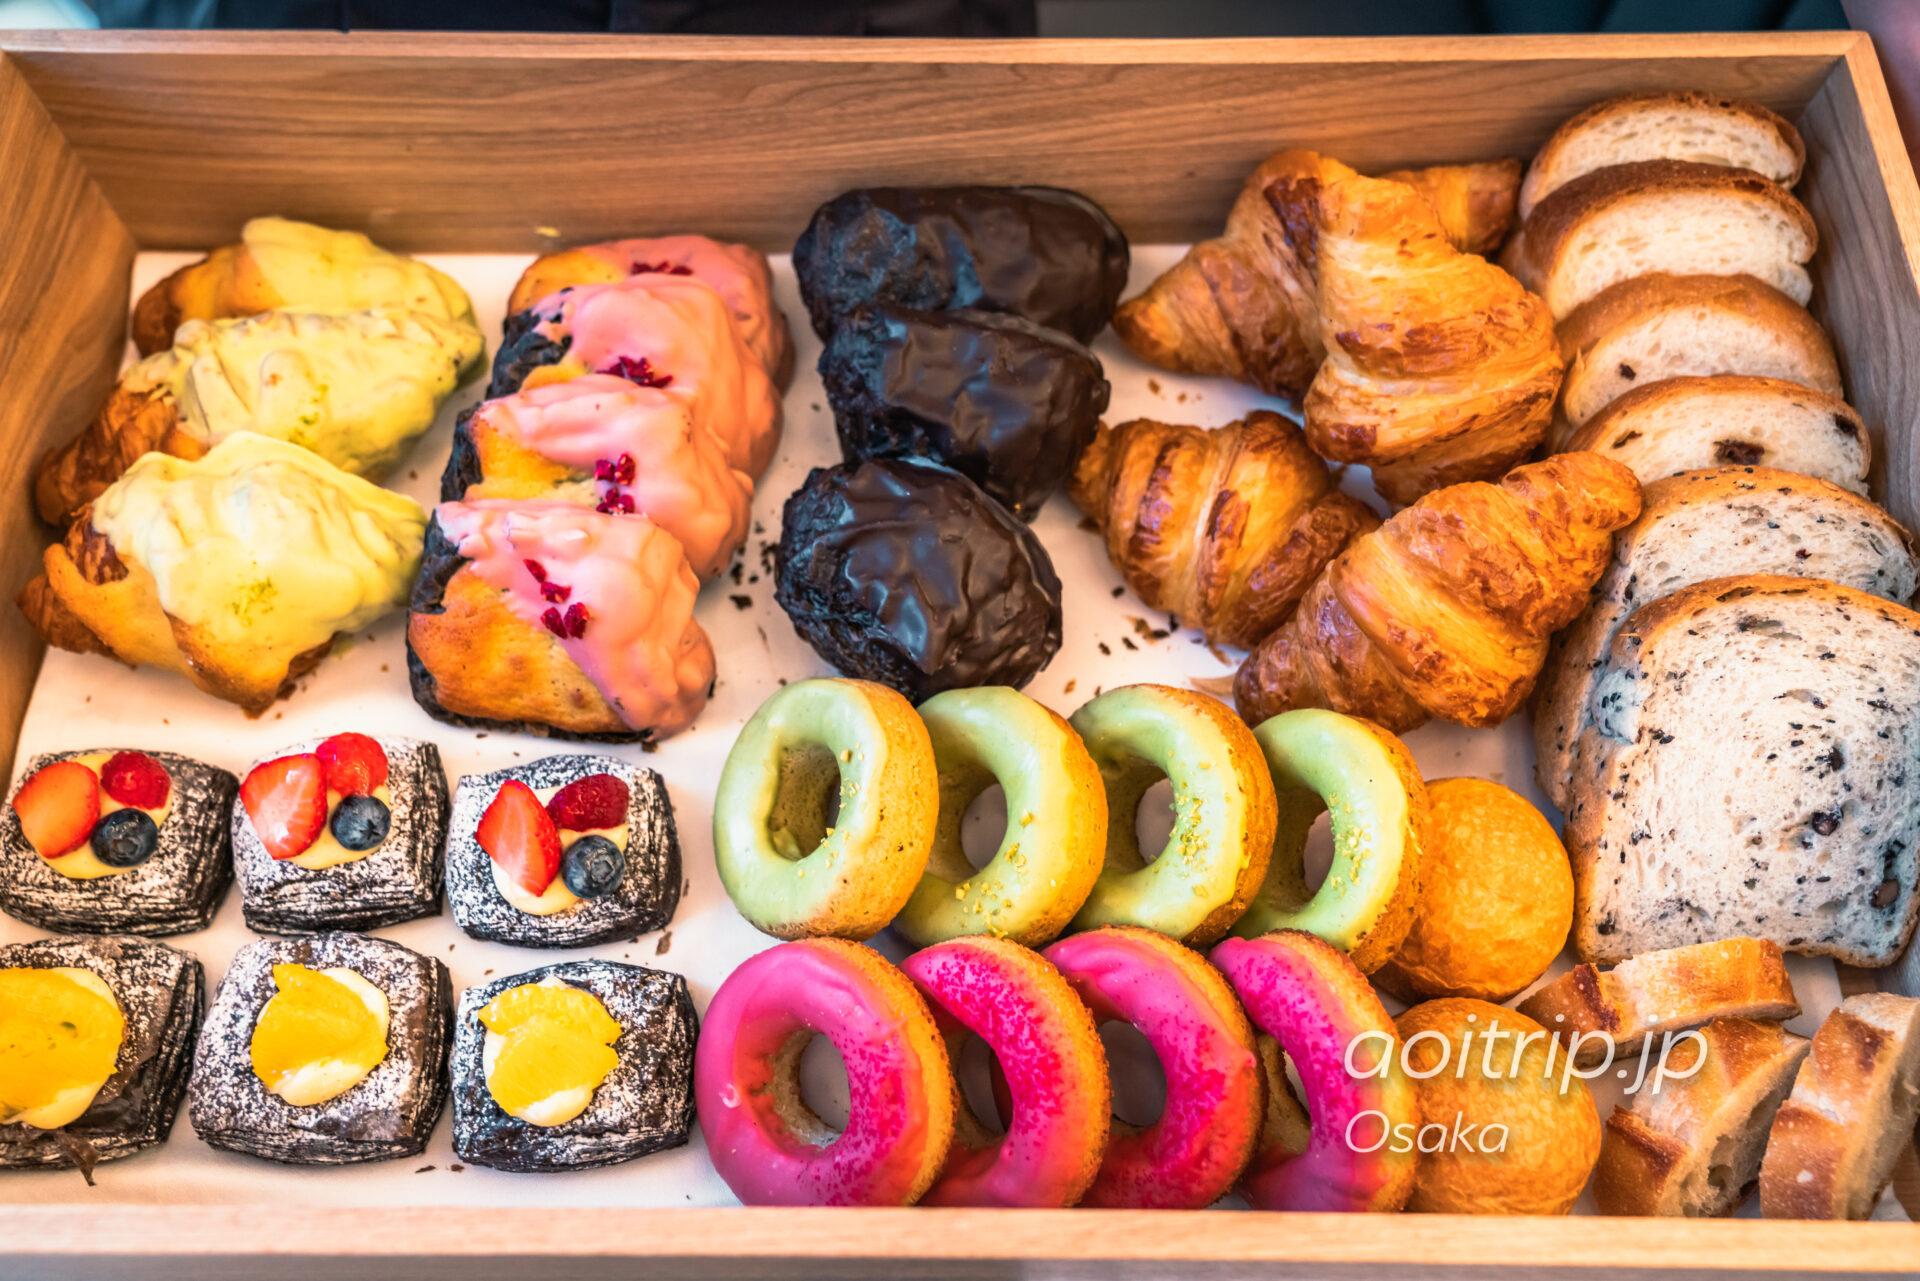 W大阪の朝食 Oh.lala…(オーララ)のベーカリー